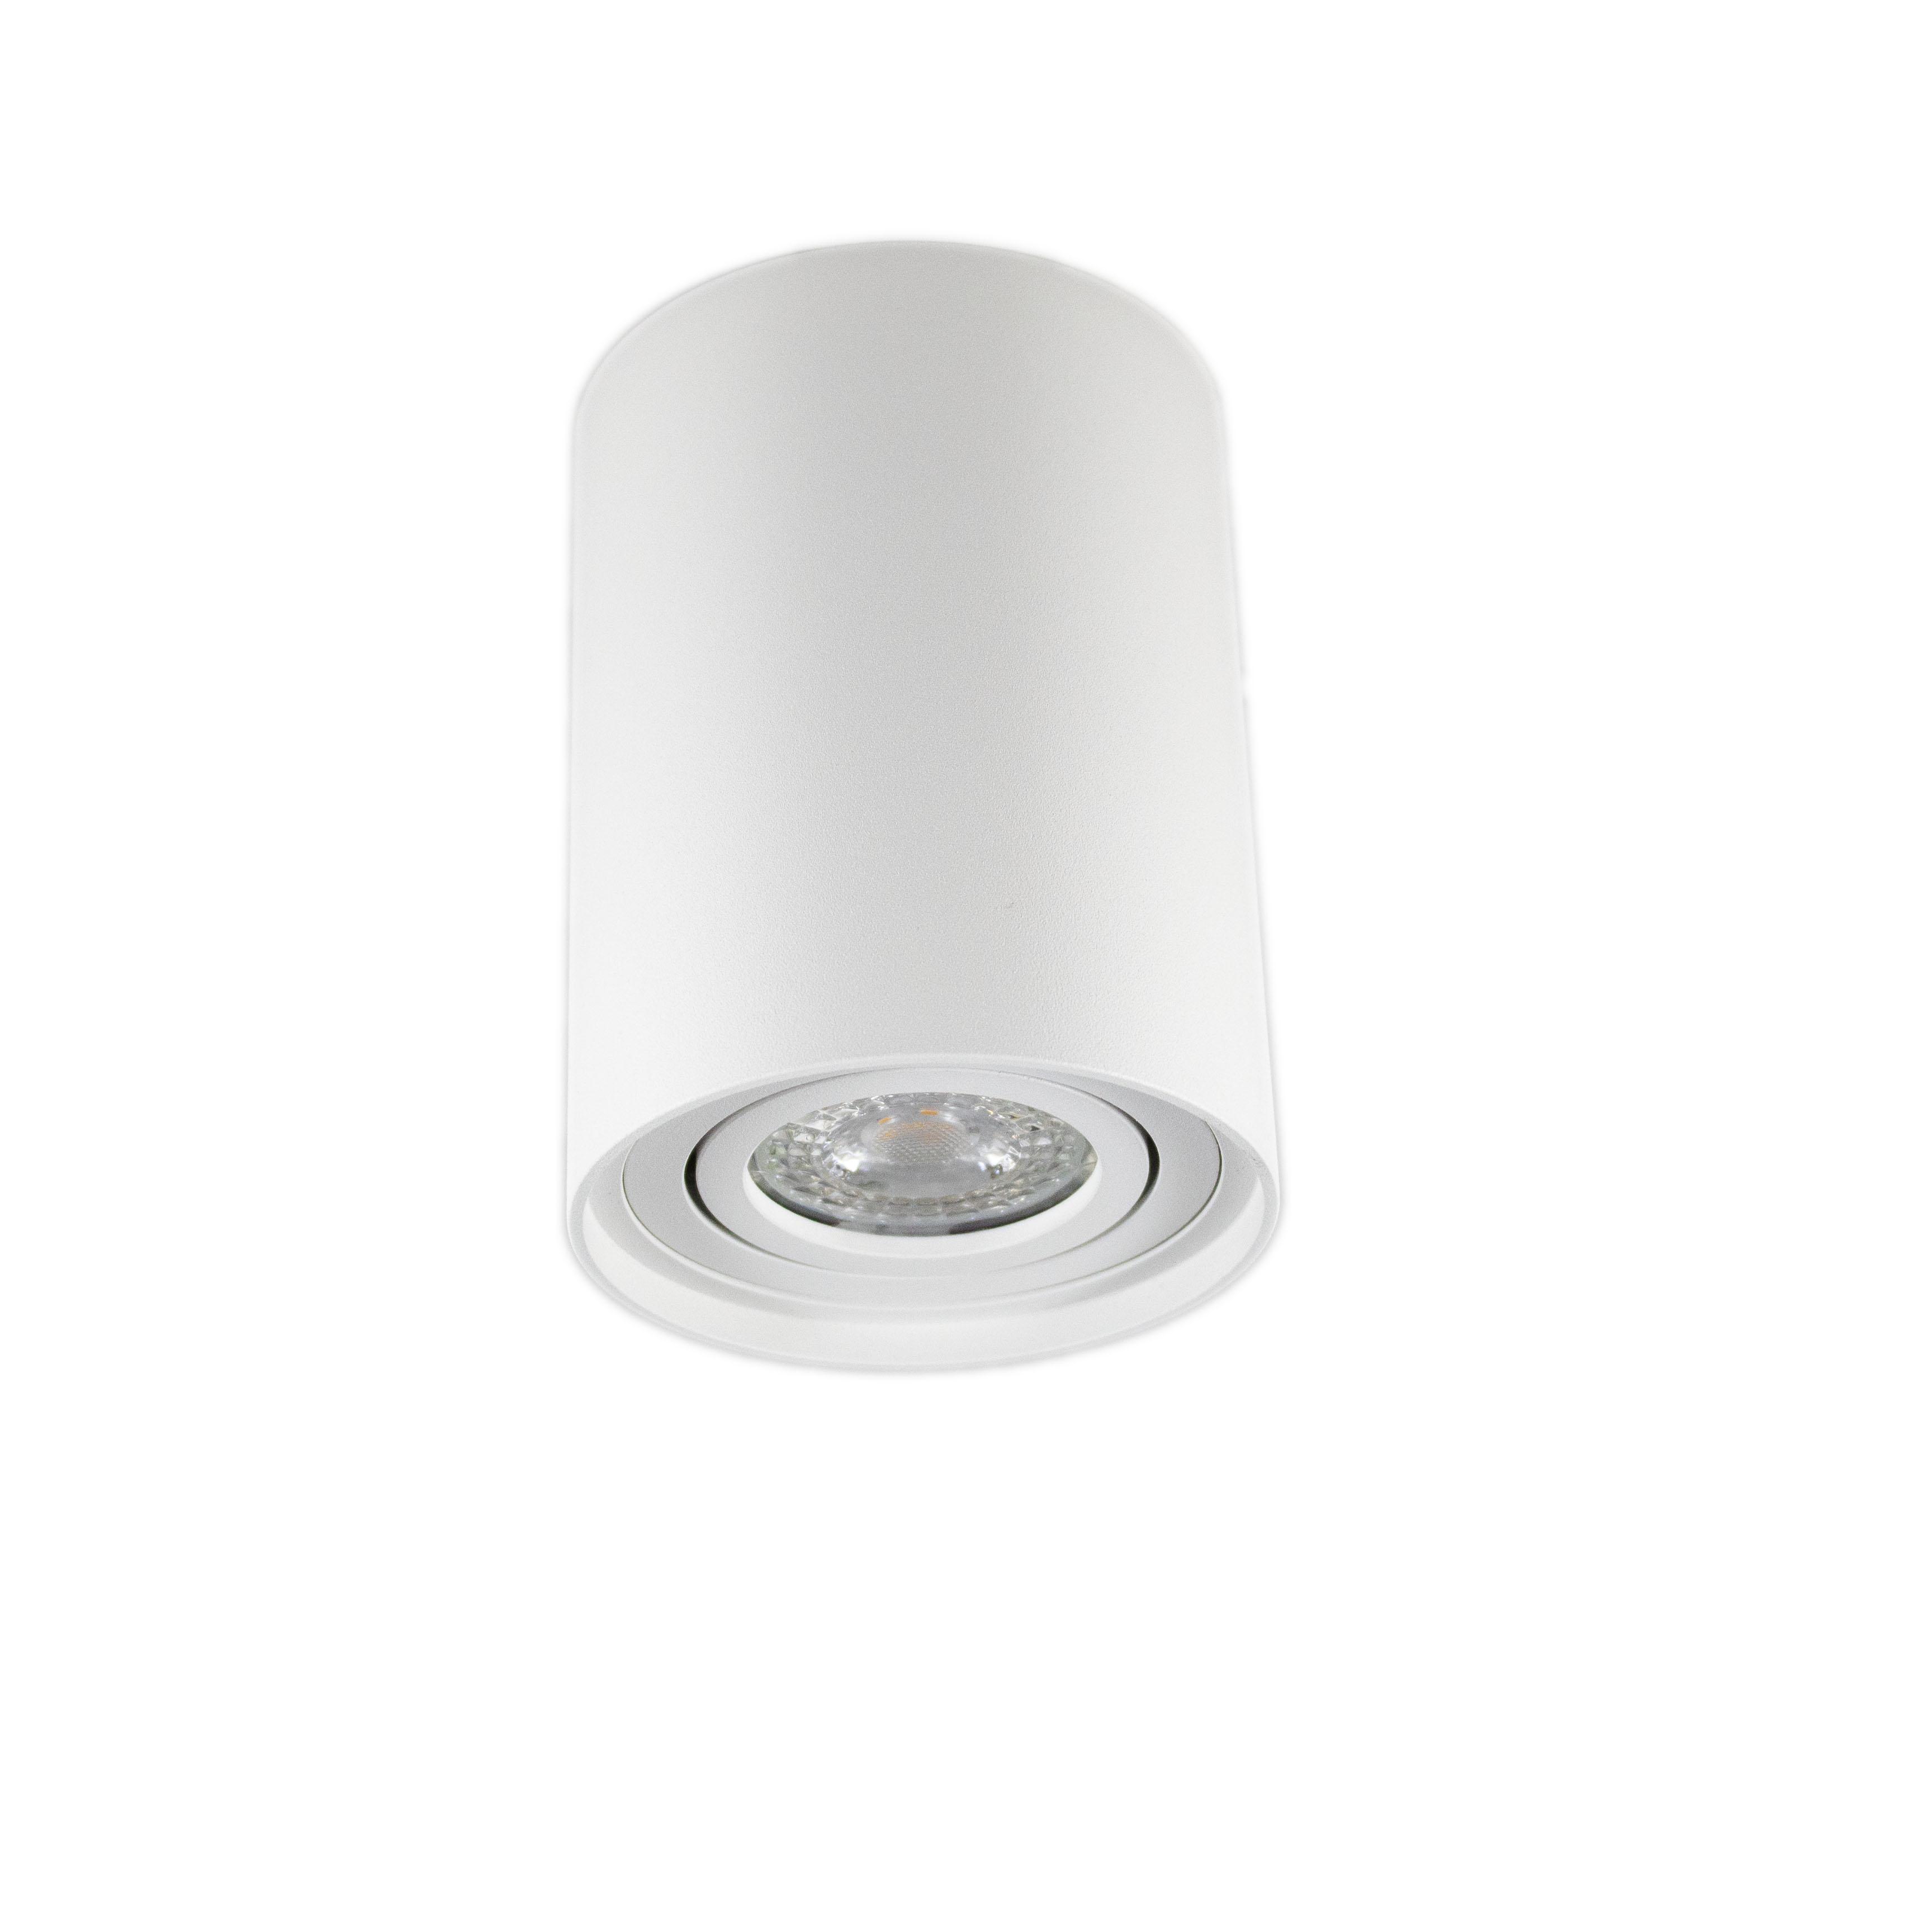 Opbouw spot armatuur wit rond kantelbaar GU10 fitting - hangend spot uit